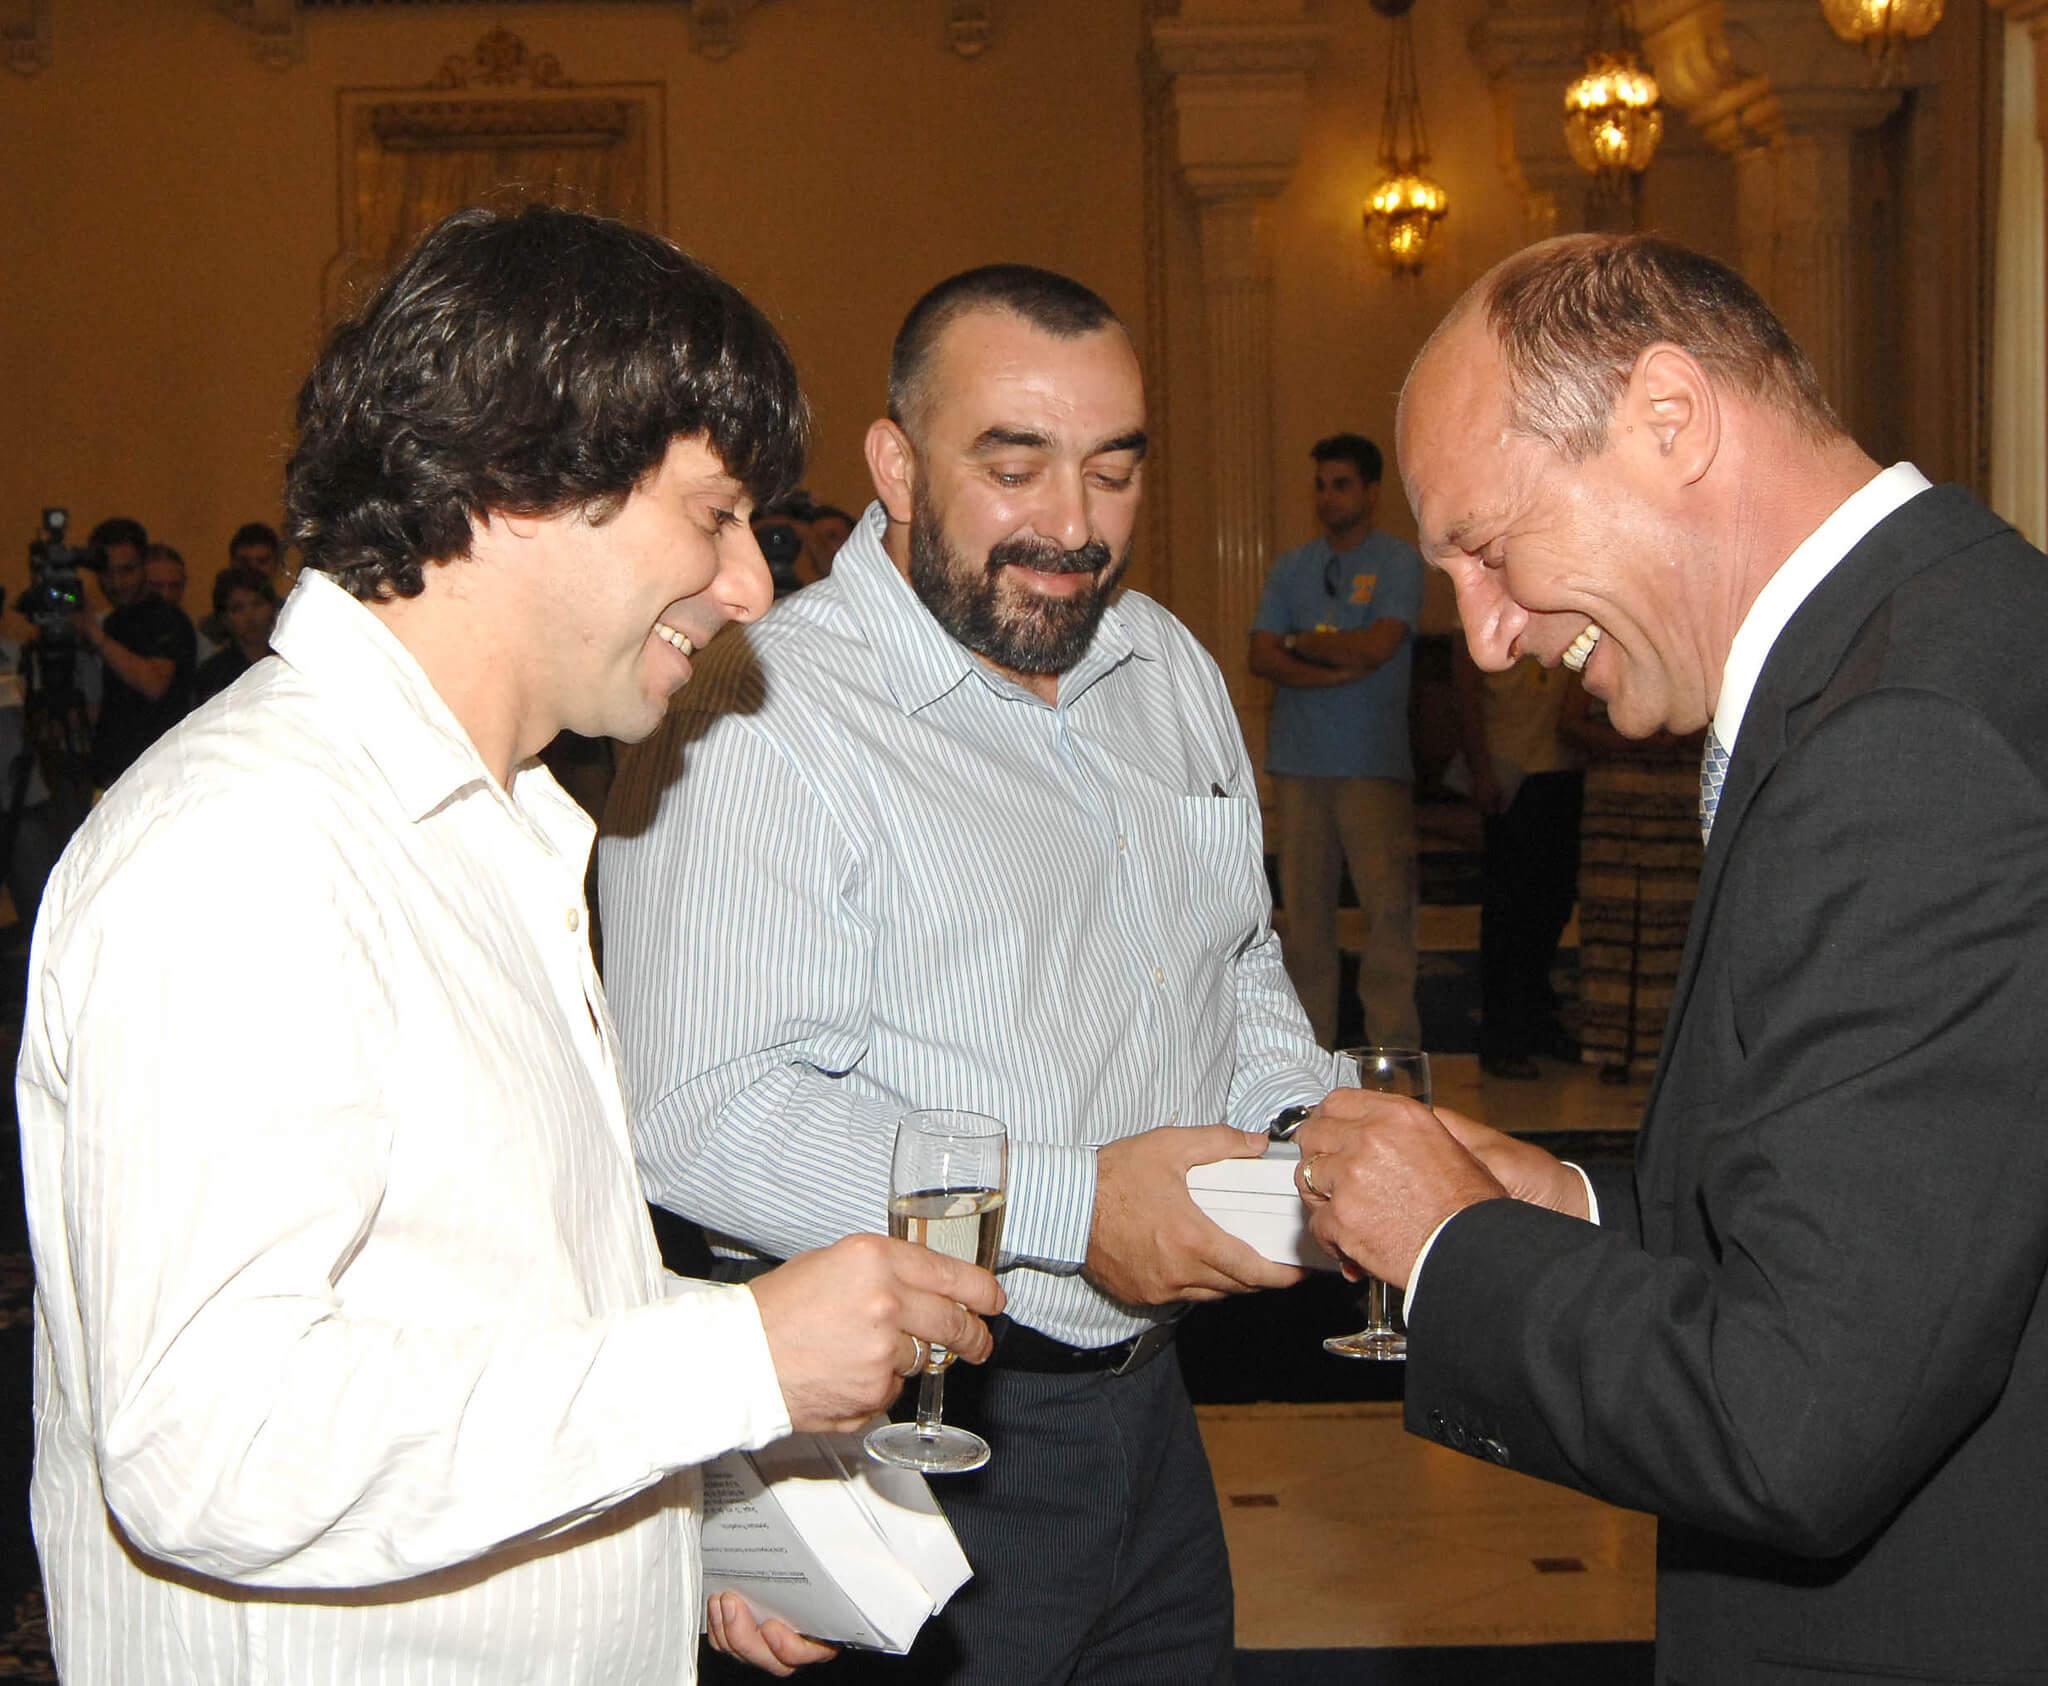 Fratii Roncea si Traian Basescu